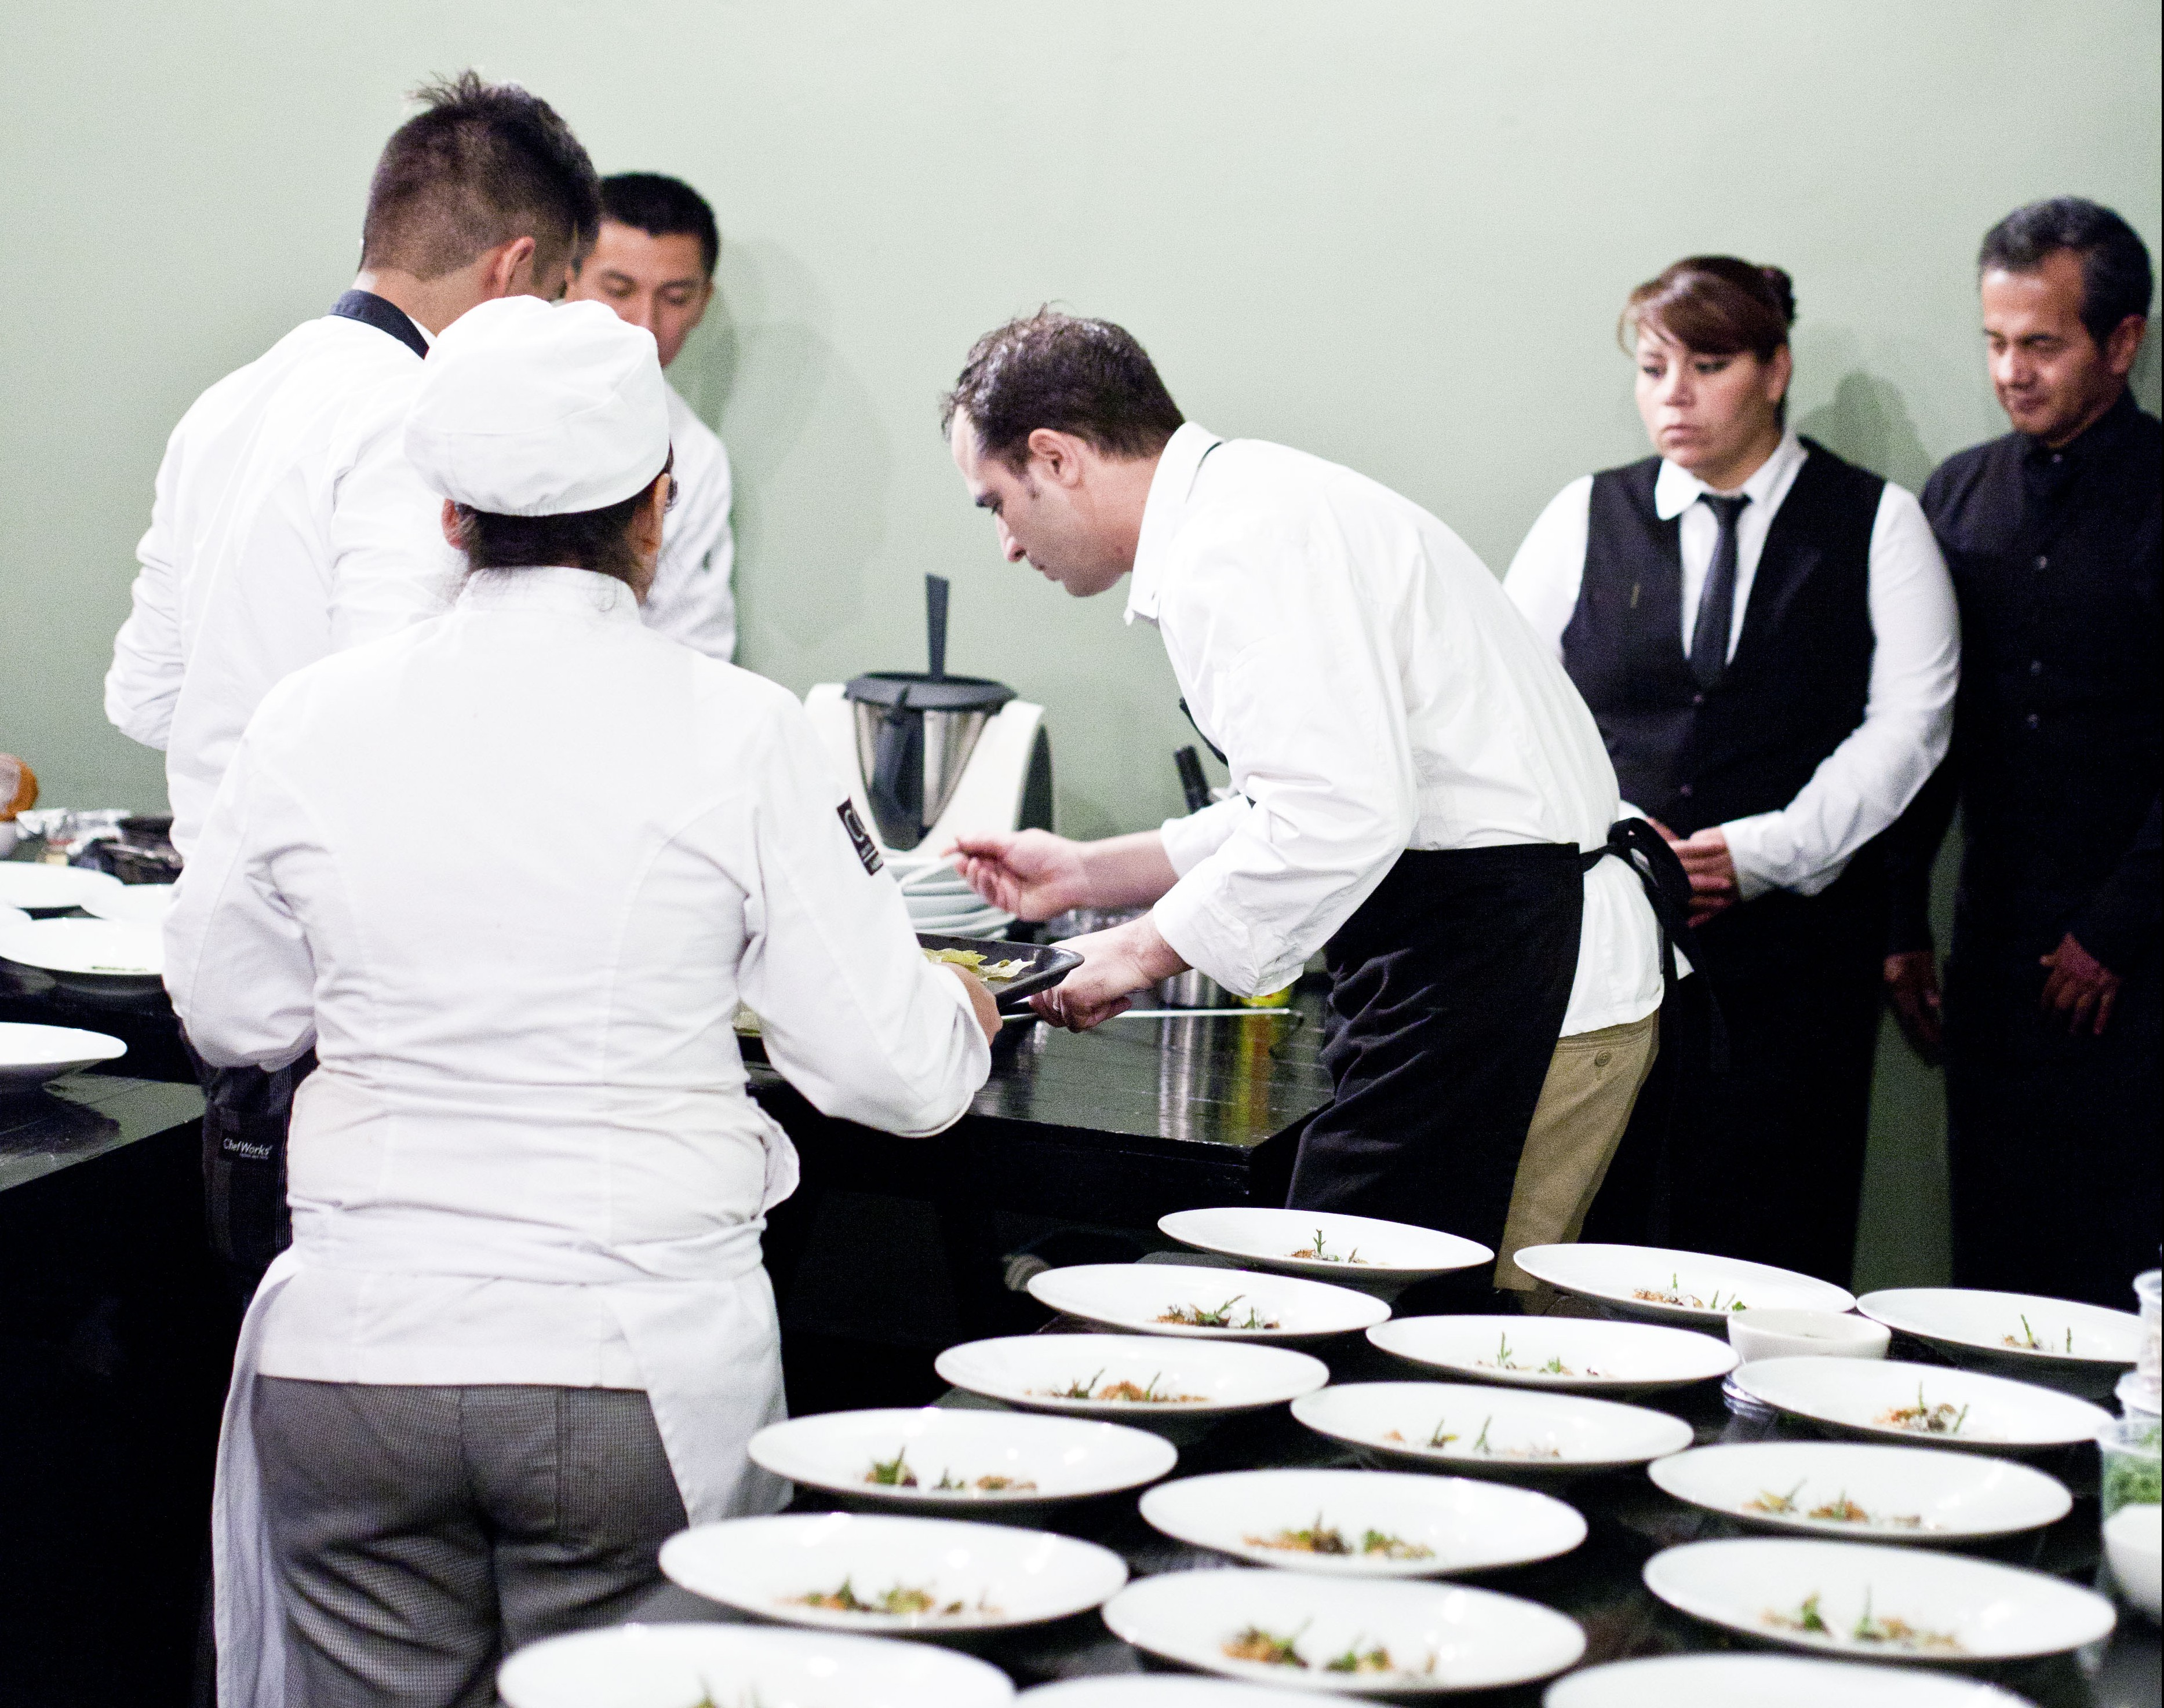 Cena con jonat n g mez luna for Deconstruccion culinaria